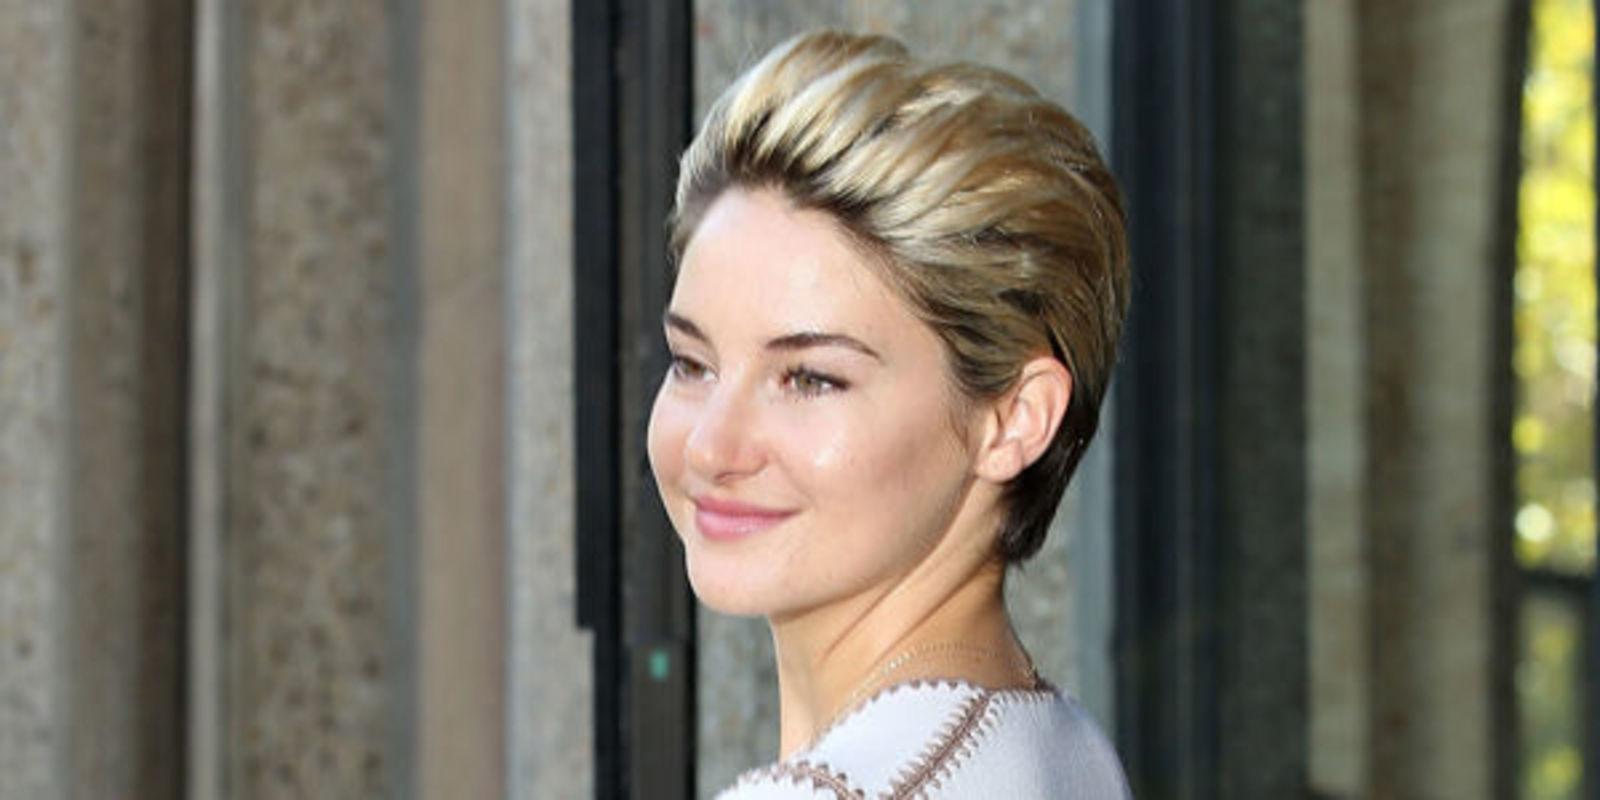 Porm celebrity hairstyles - Porm Celebrity Hairstyles 47